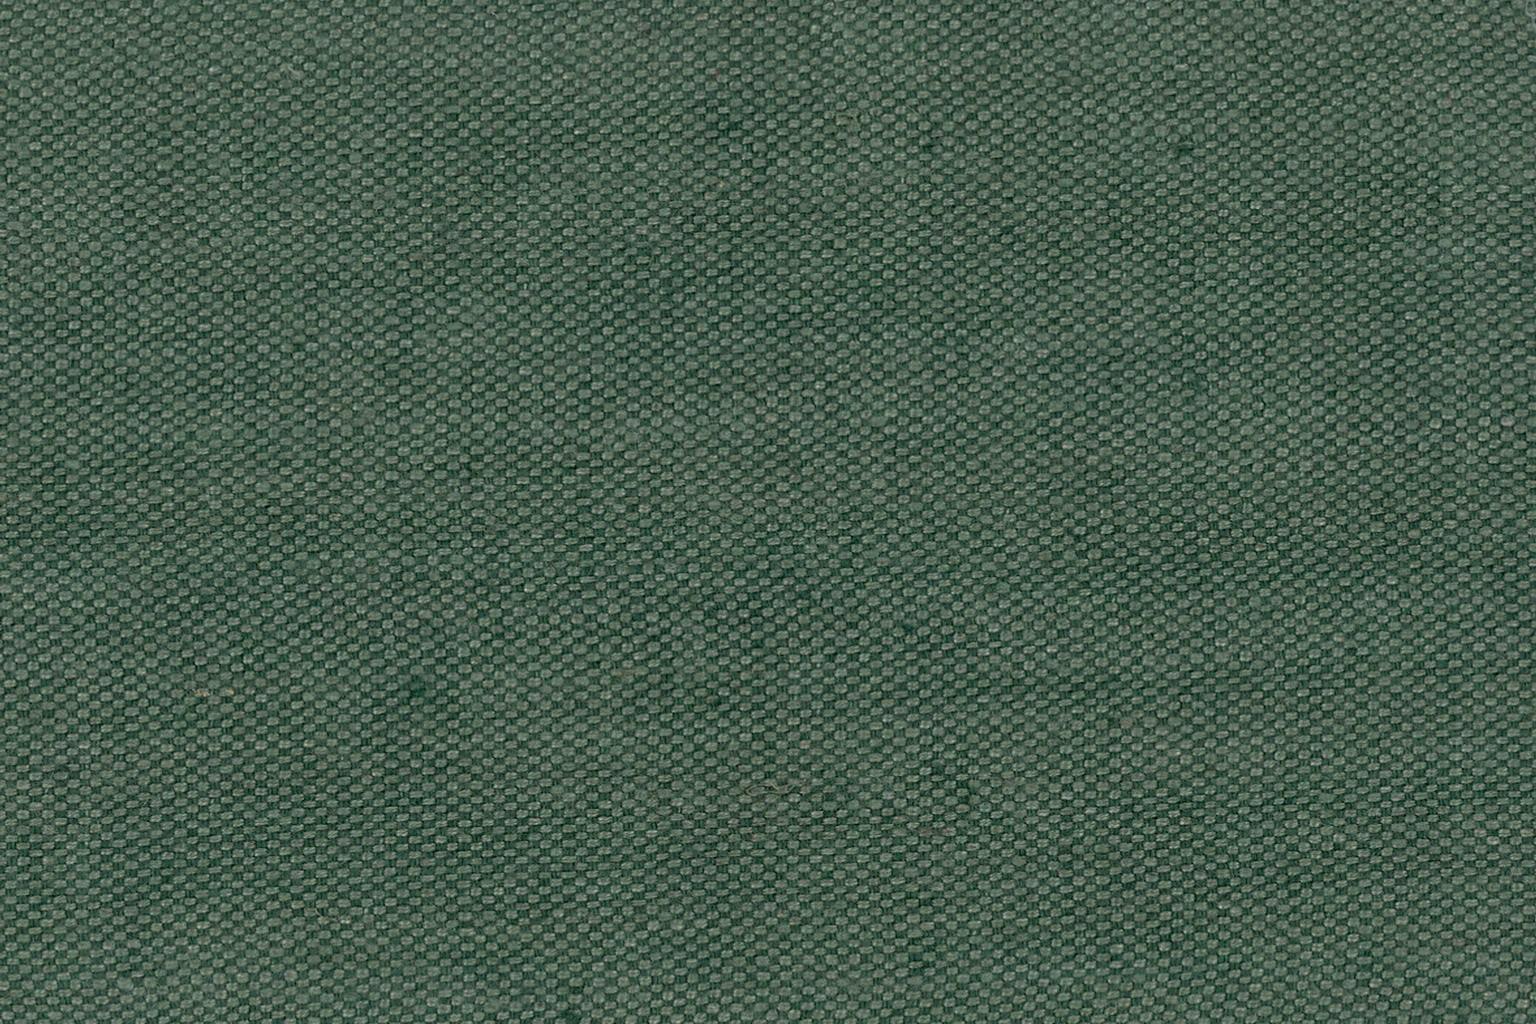 CORTINA Green